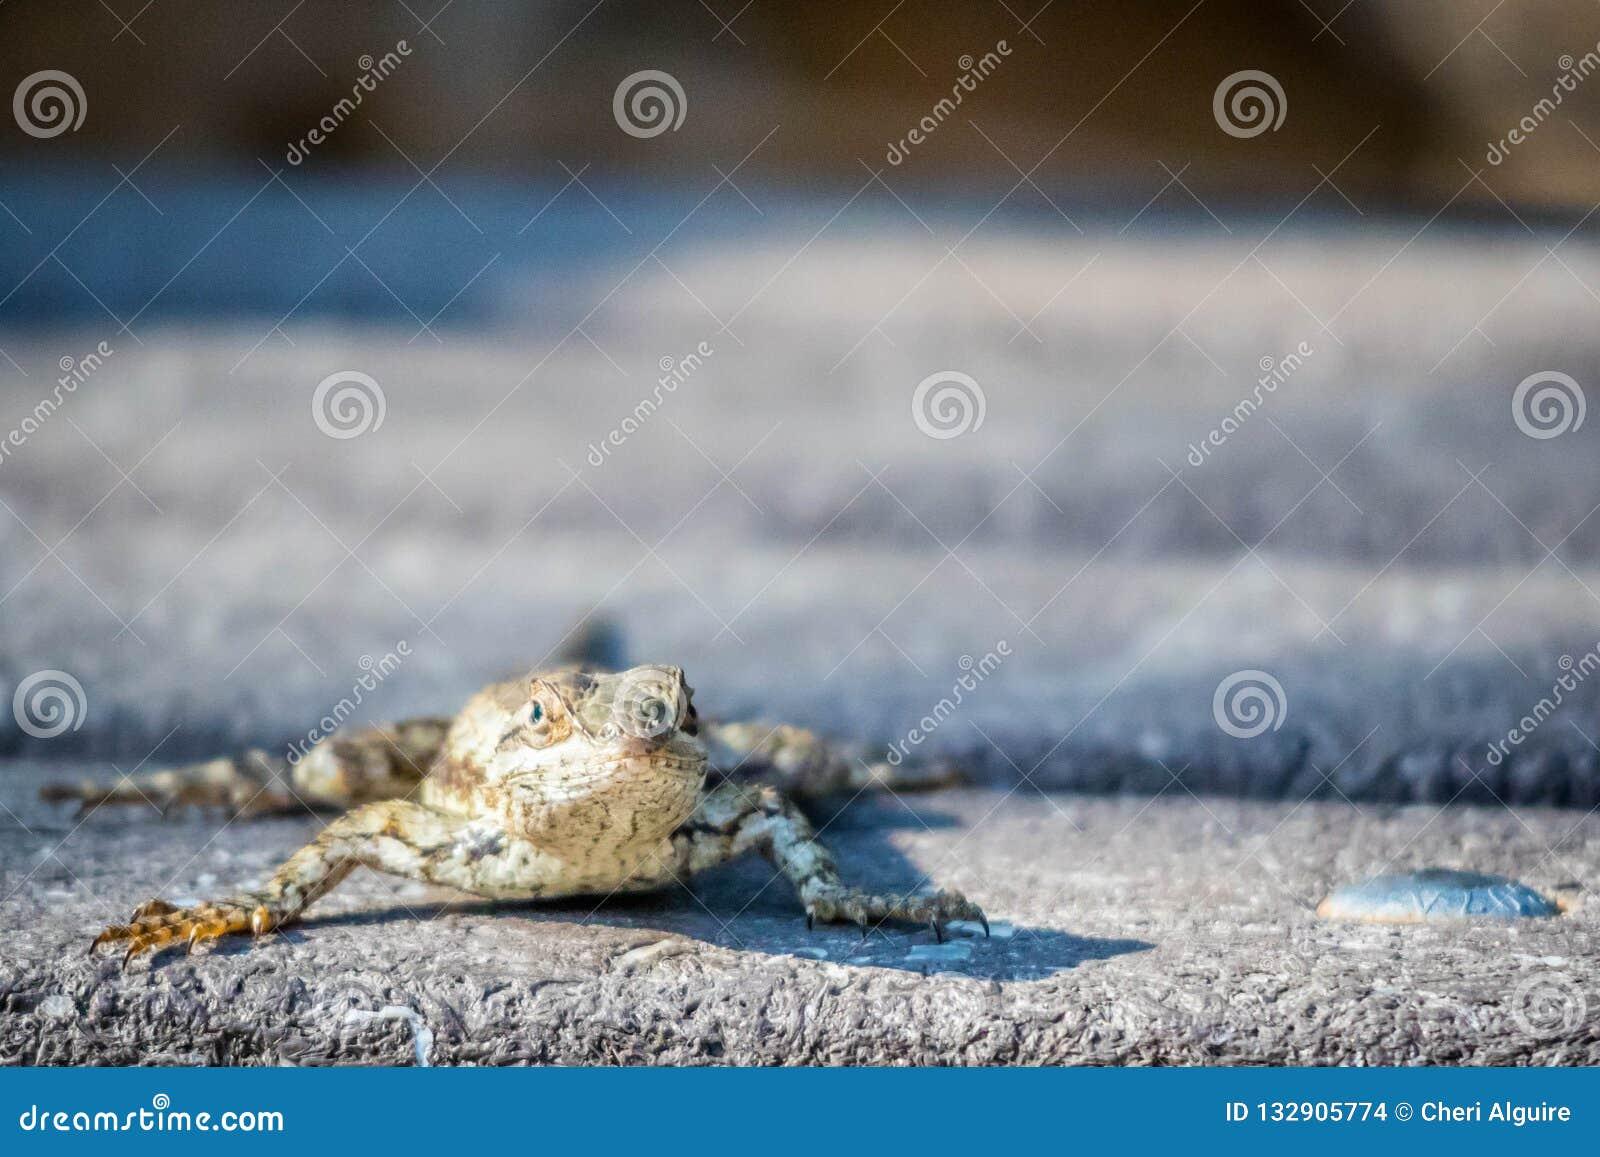 En Texas Spiny Lizard i Harlingen, Texas